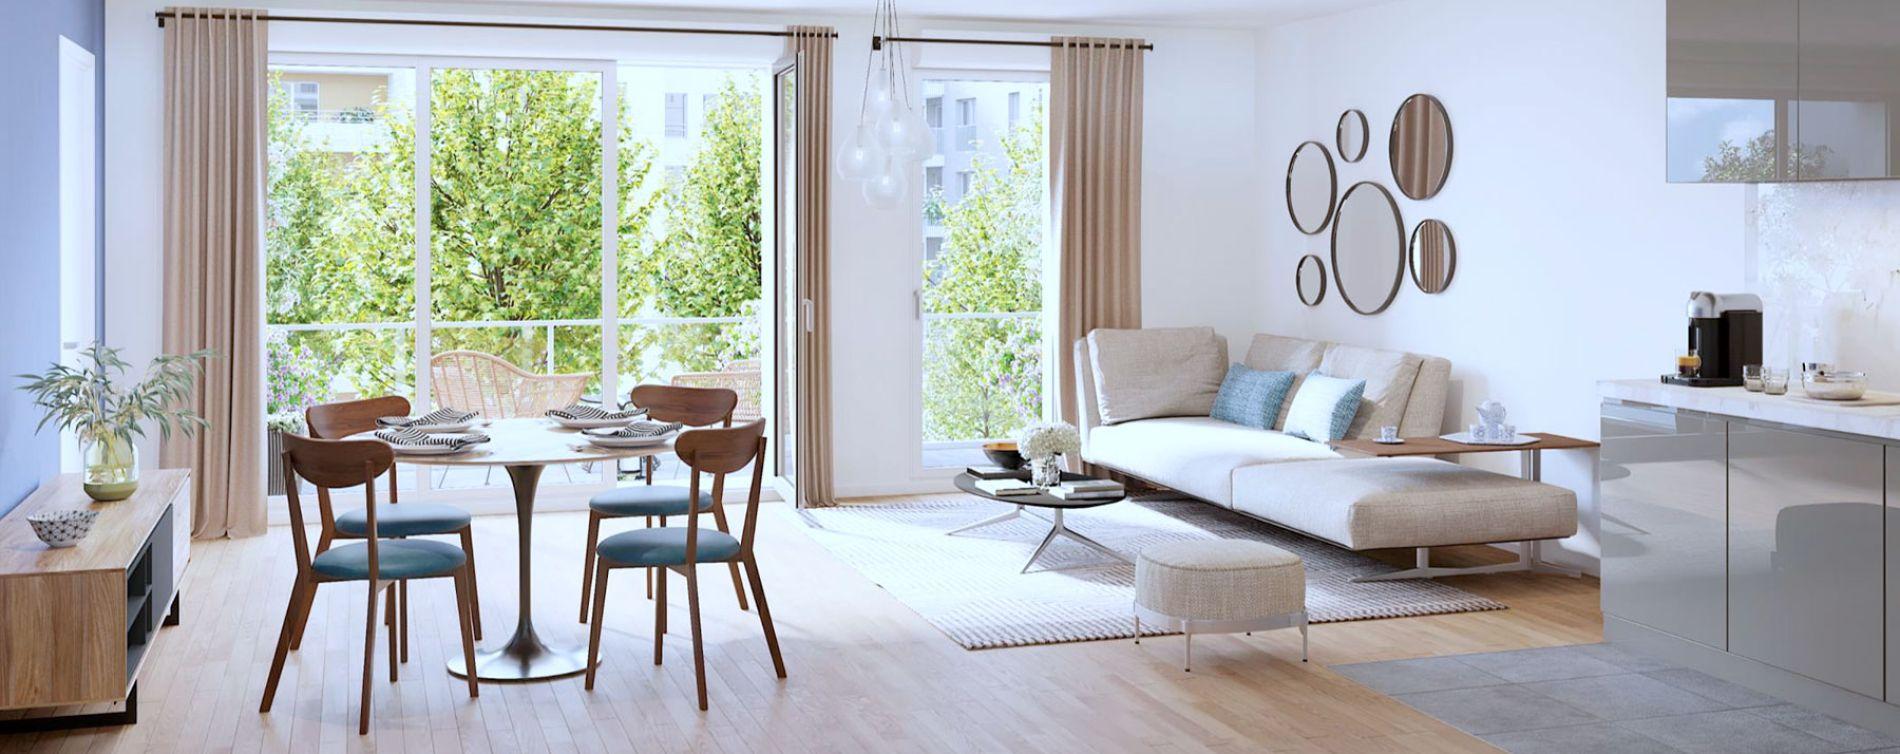 Rueil-Malmaison : programme immobilier neuve « 6 rue Paul Heroult » (3)